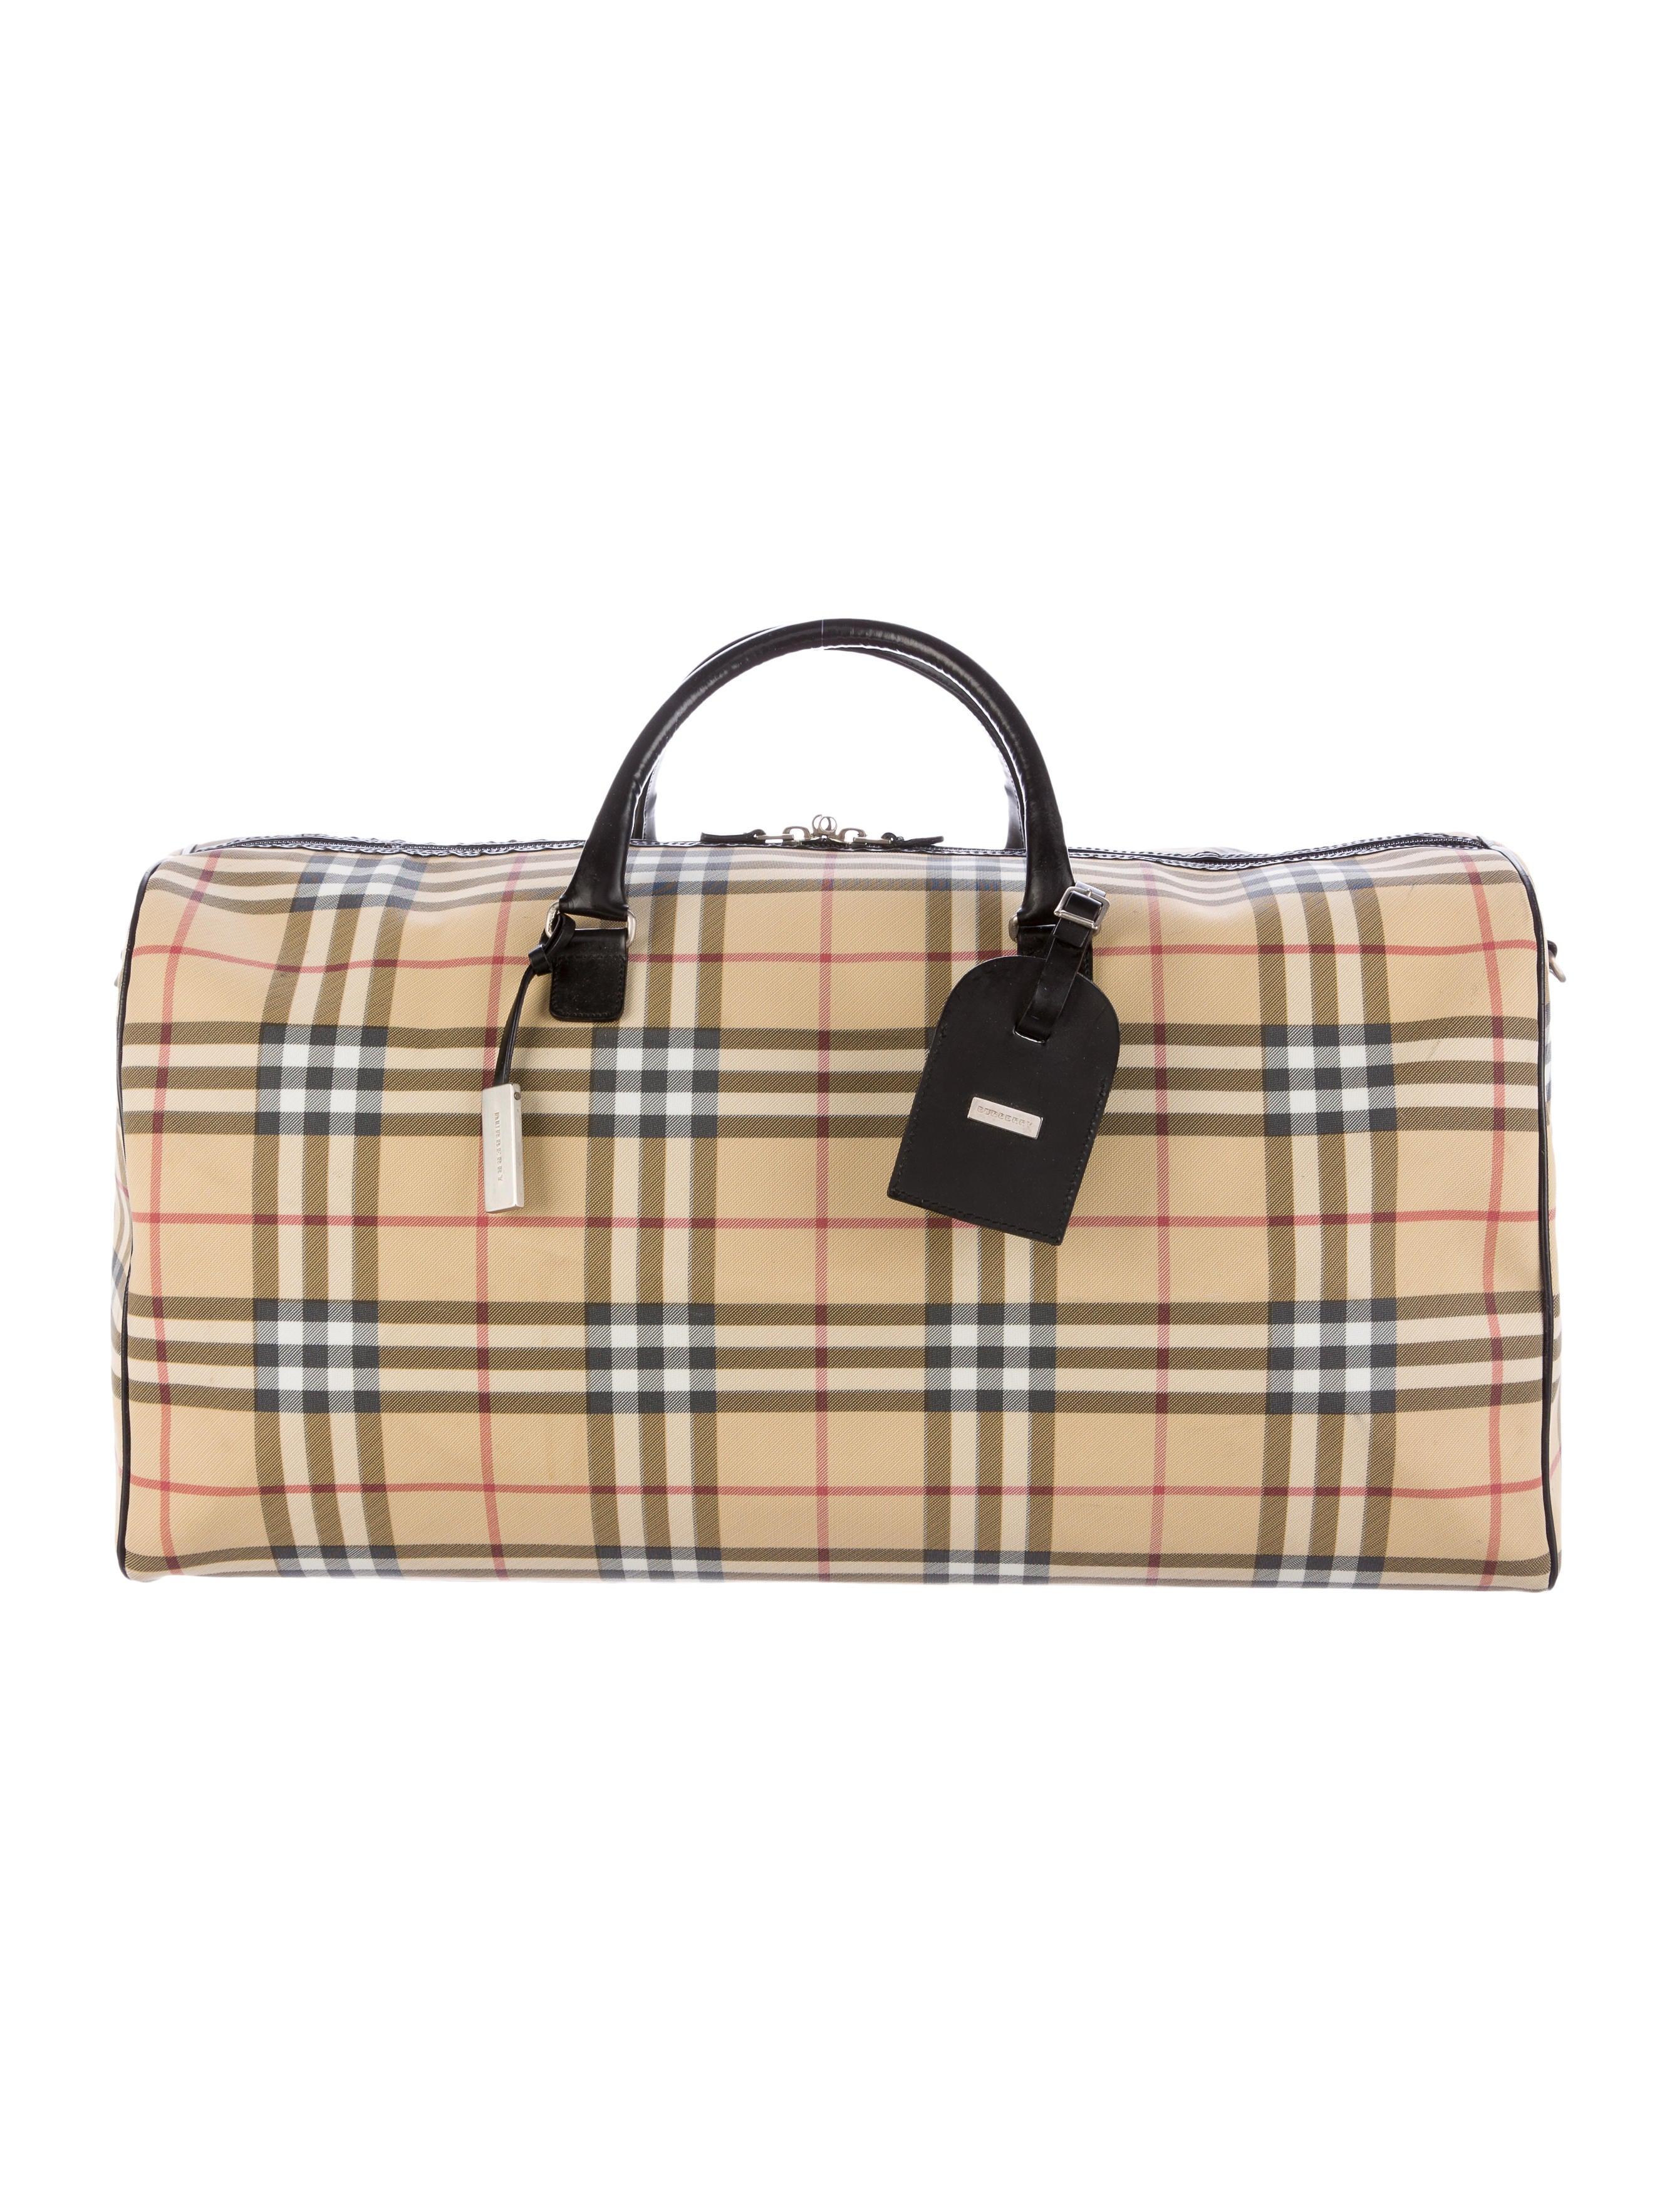 038b3c04d269 Burberry Nova Check Weekender - Handbags - BUR69248